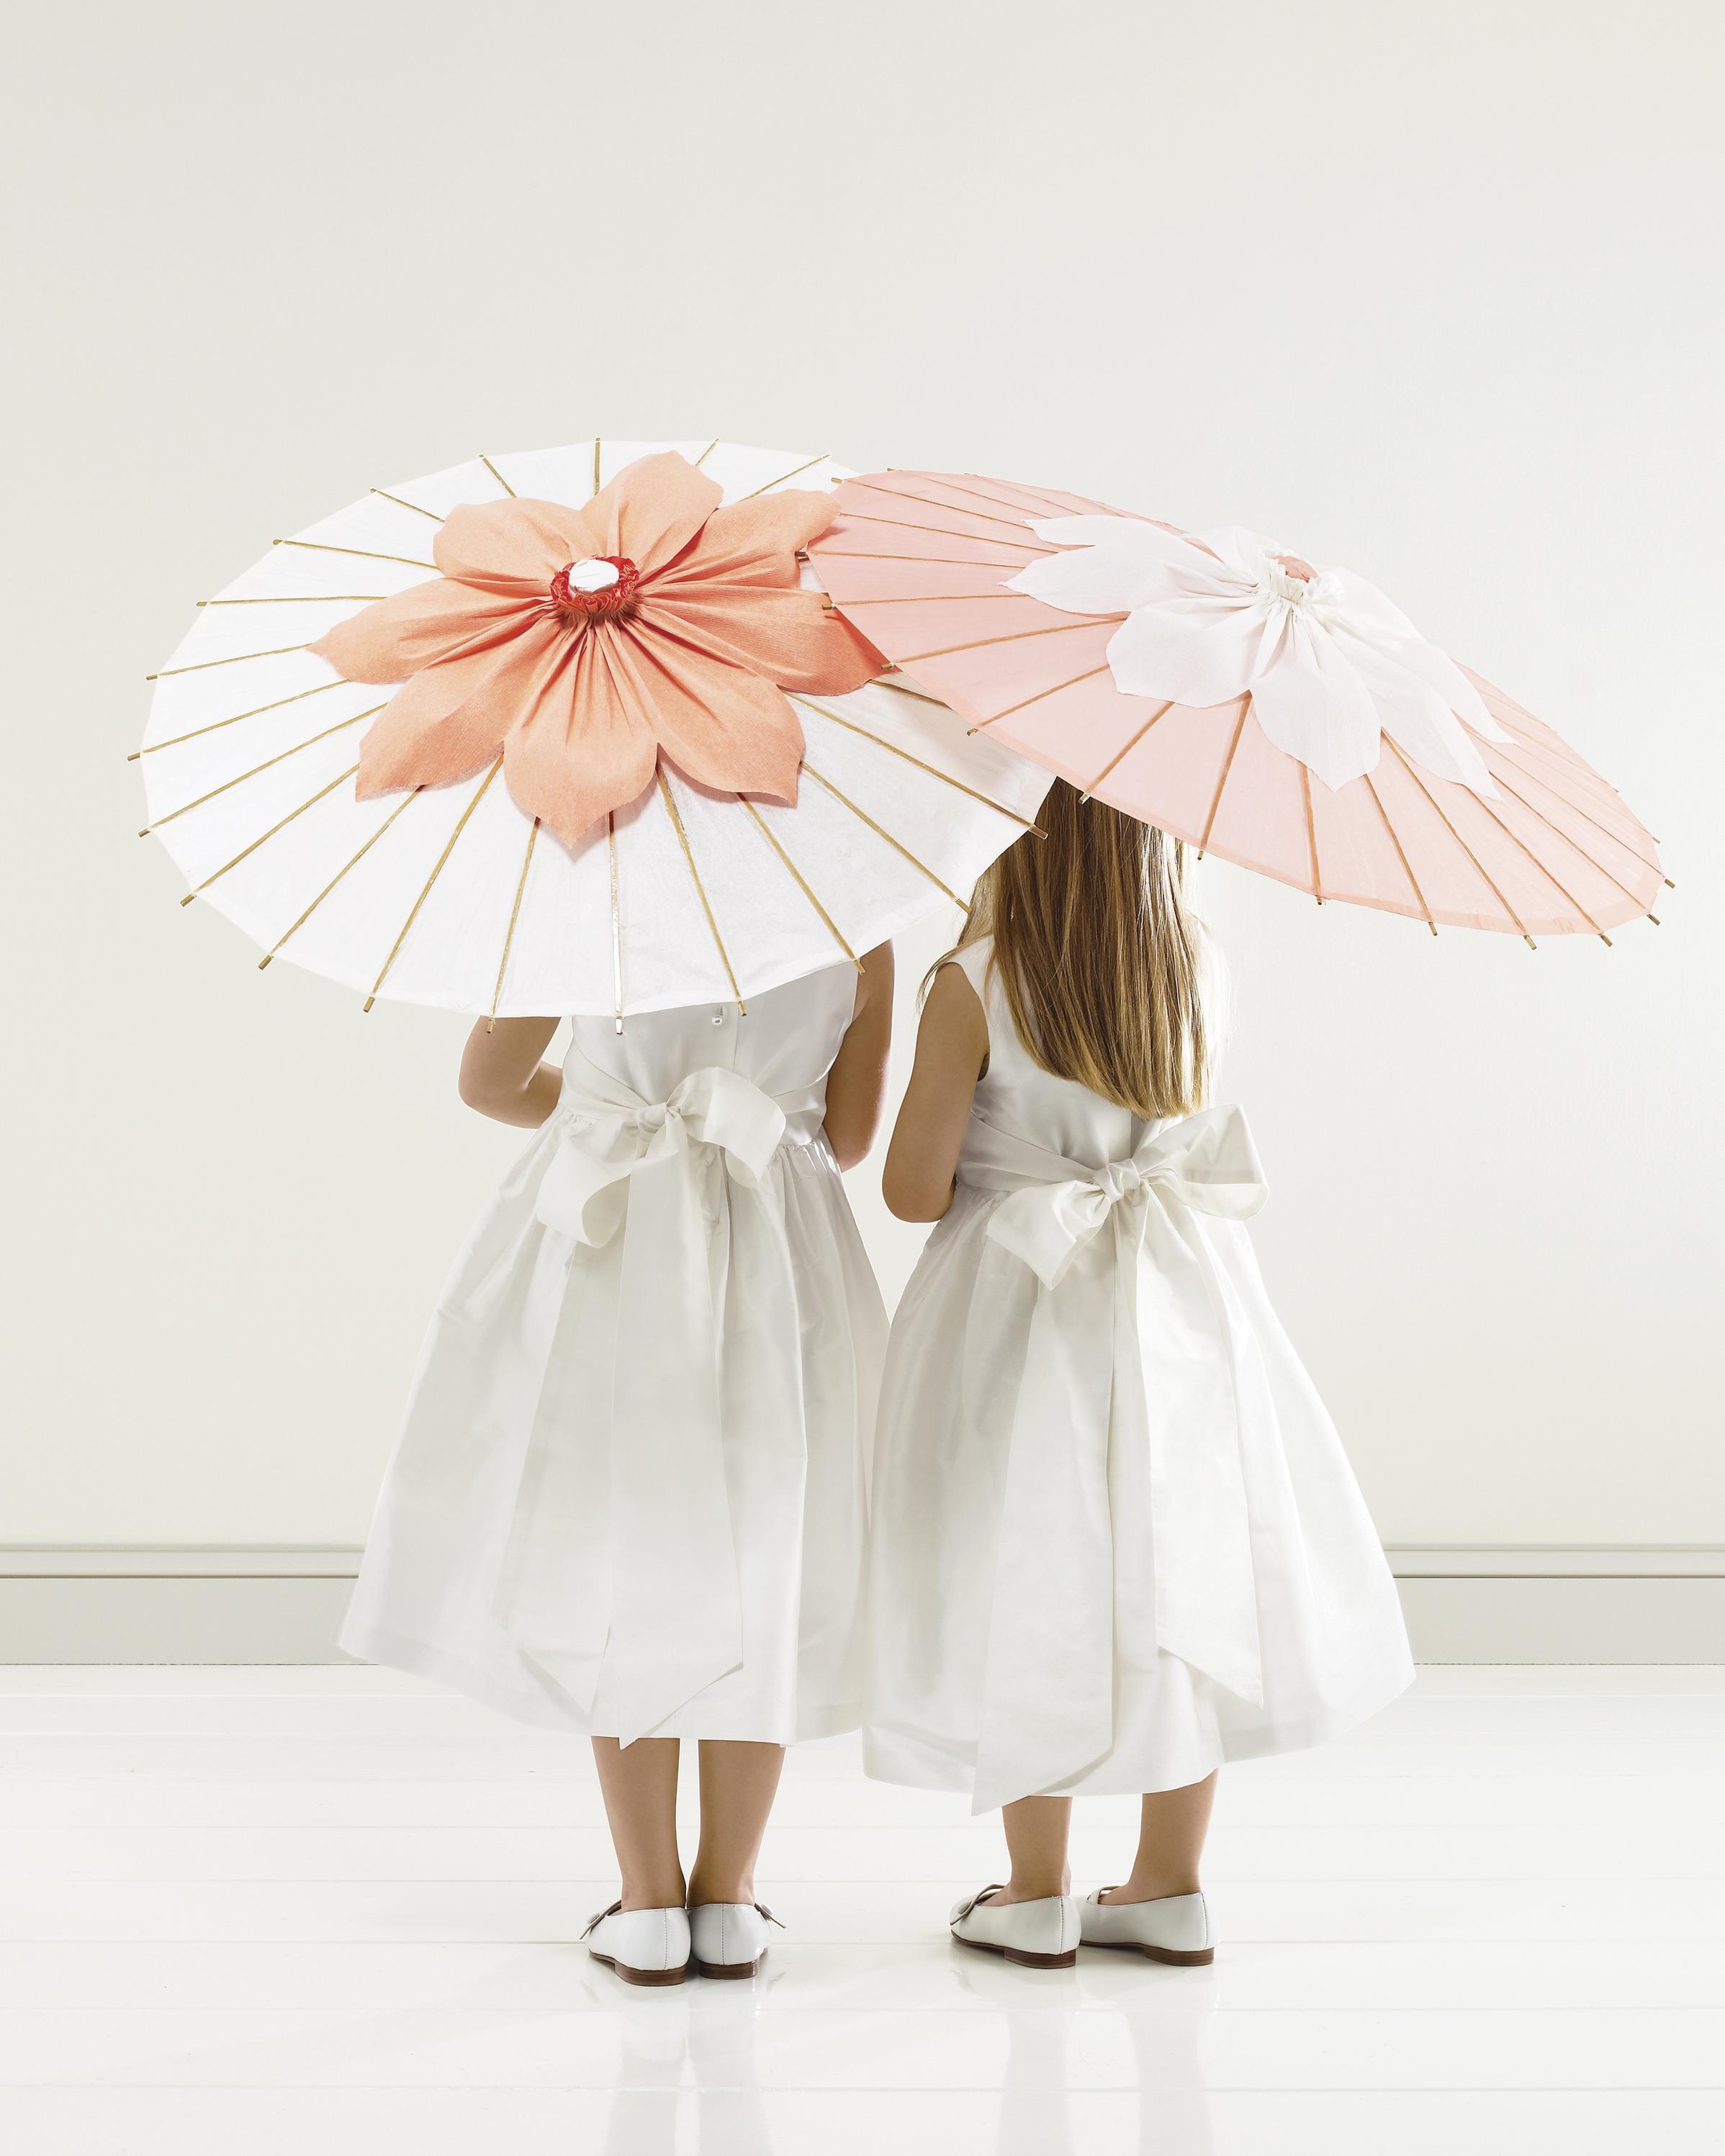 outdoor-wedding-decorations-mwd104505-parasol-0515.jpg